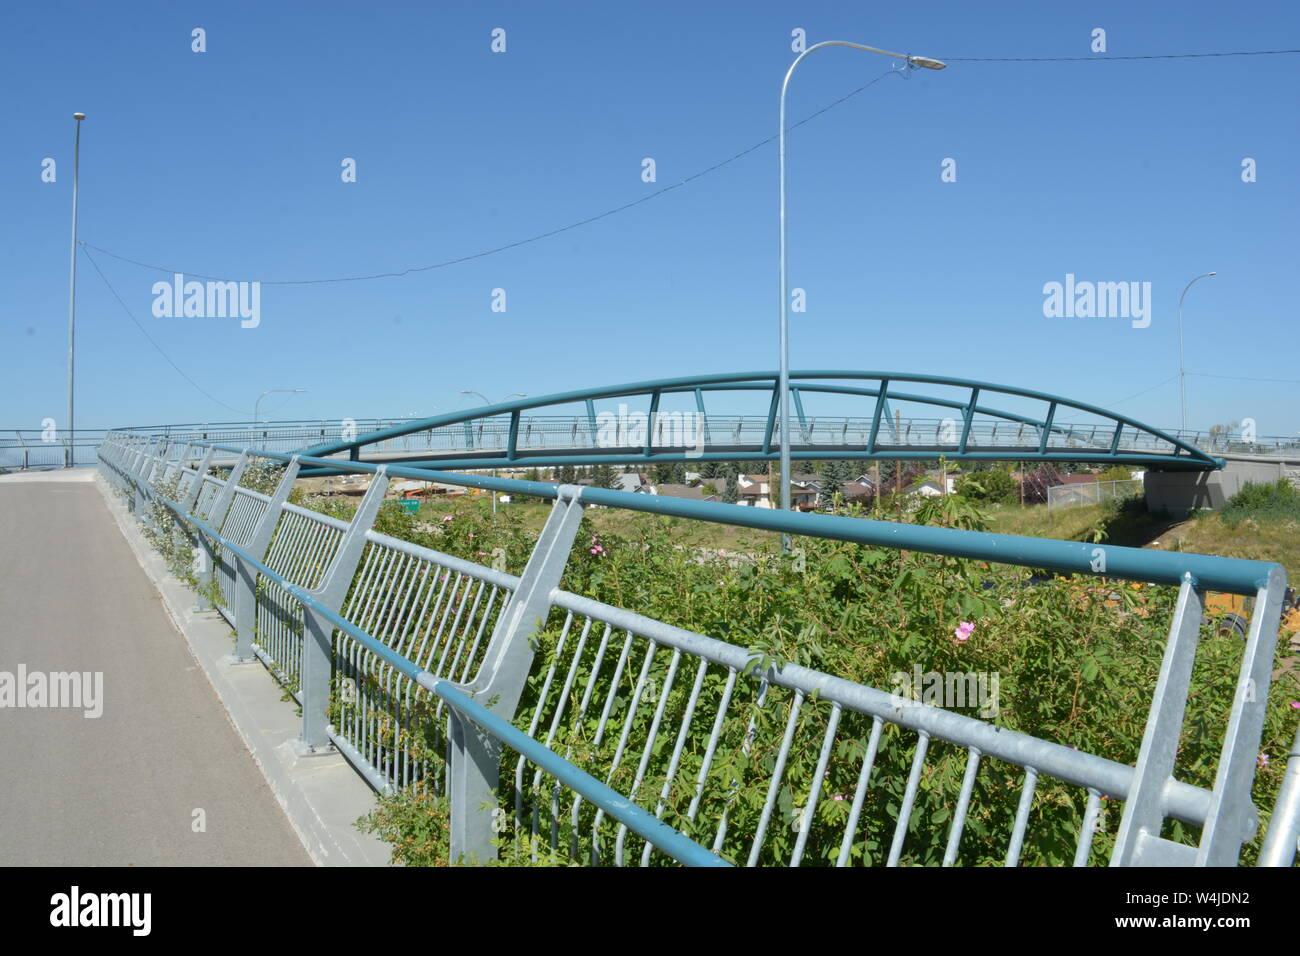 Pedestrian bridge and handrail crossing highway Stock Photo